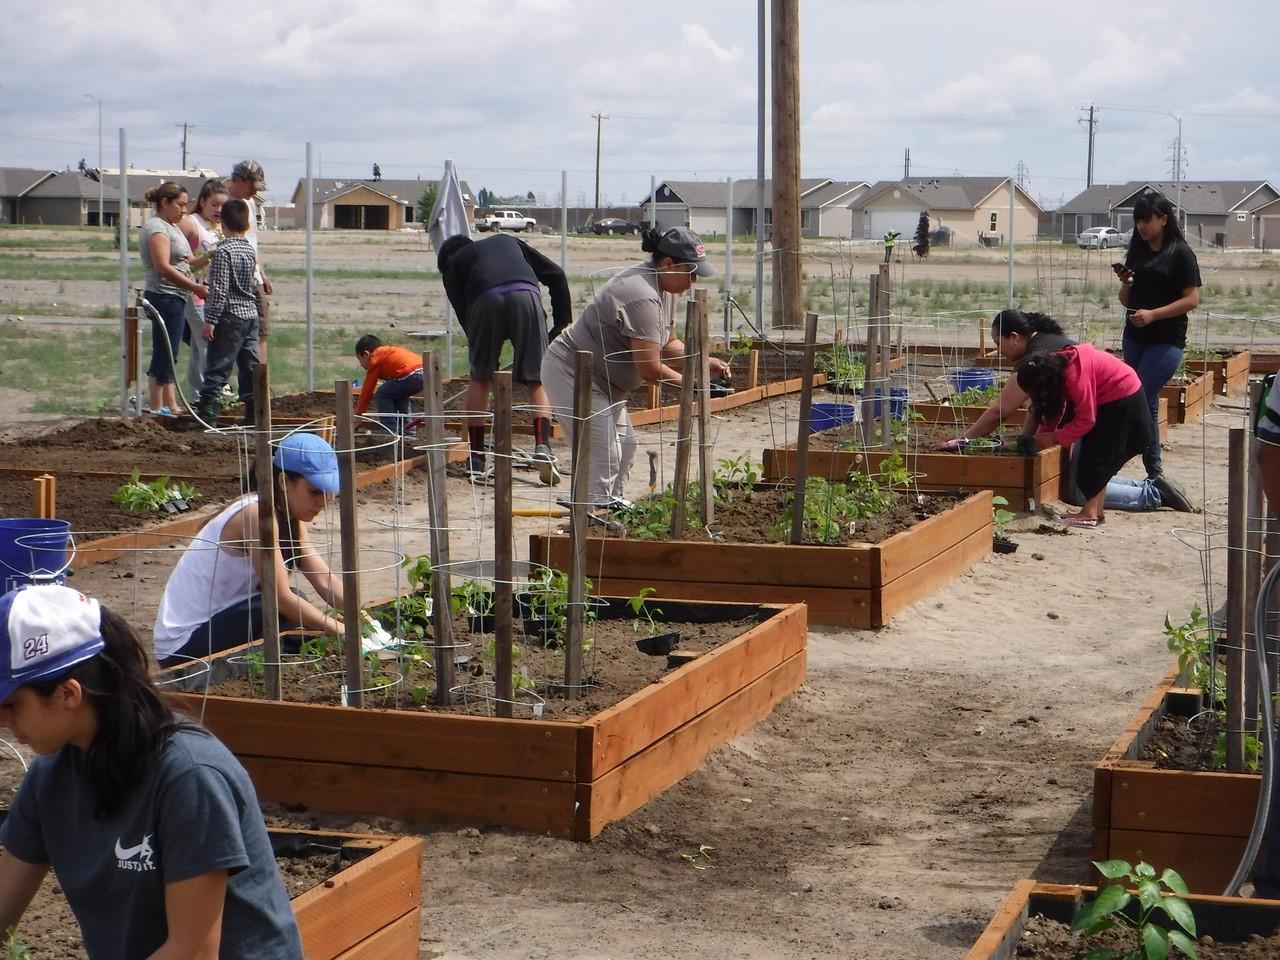 Community members tending community garden boxes.